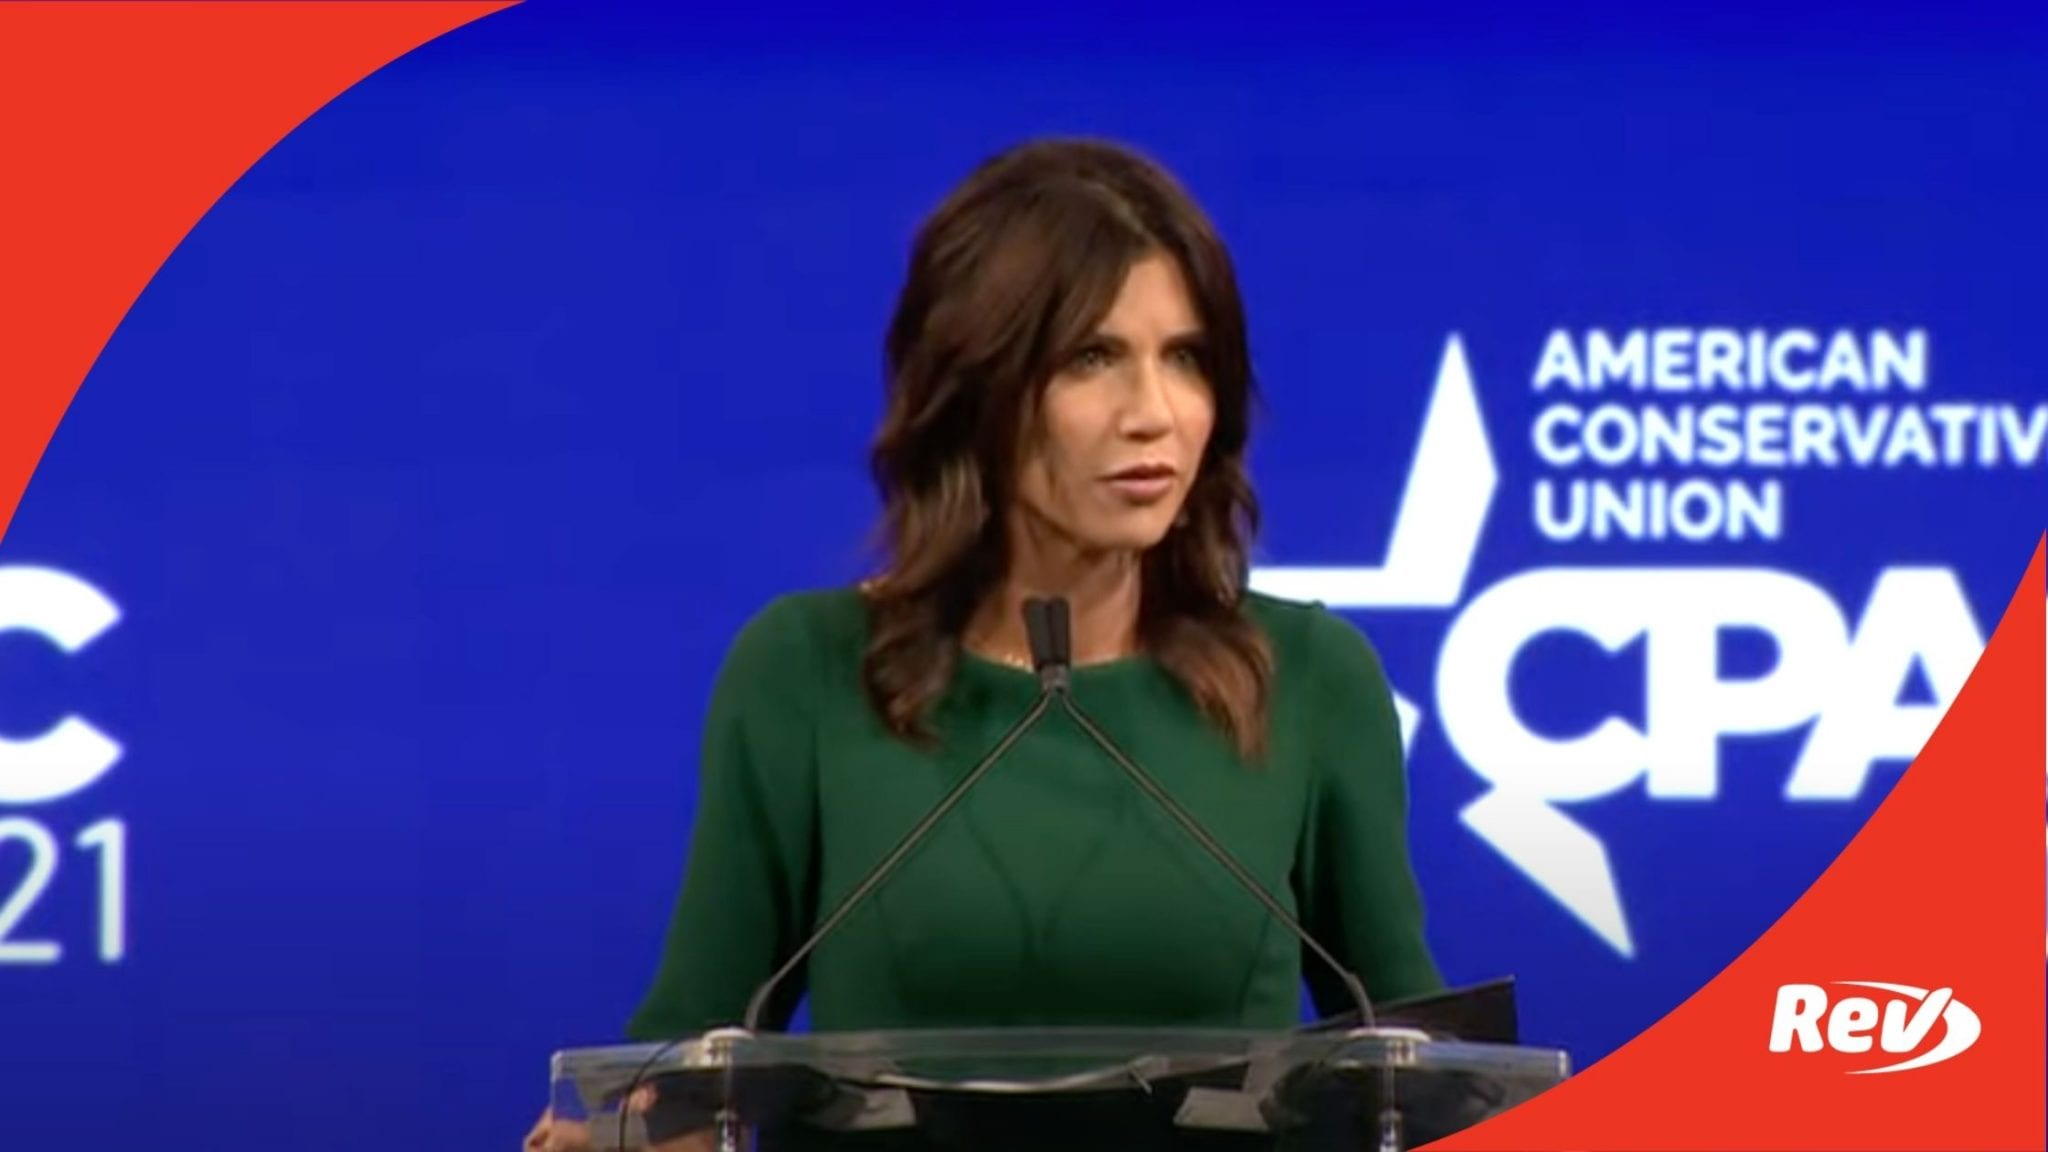 Kristi Noem CPAC 2021 Speech